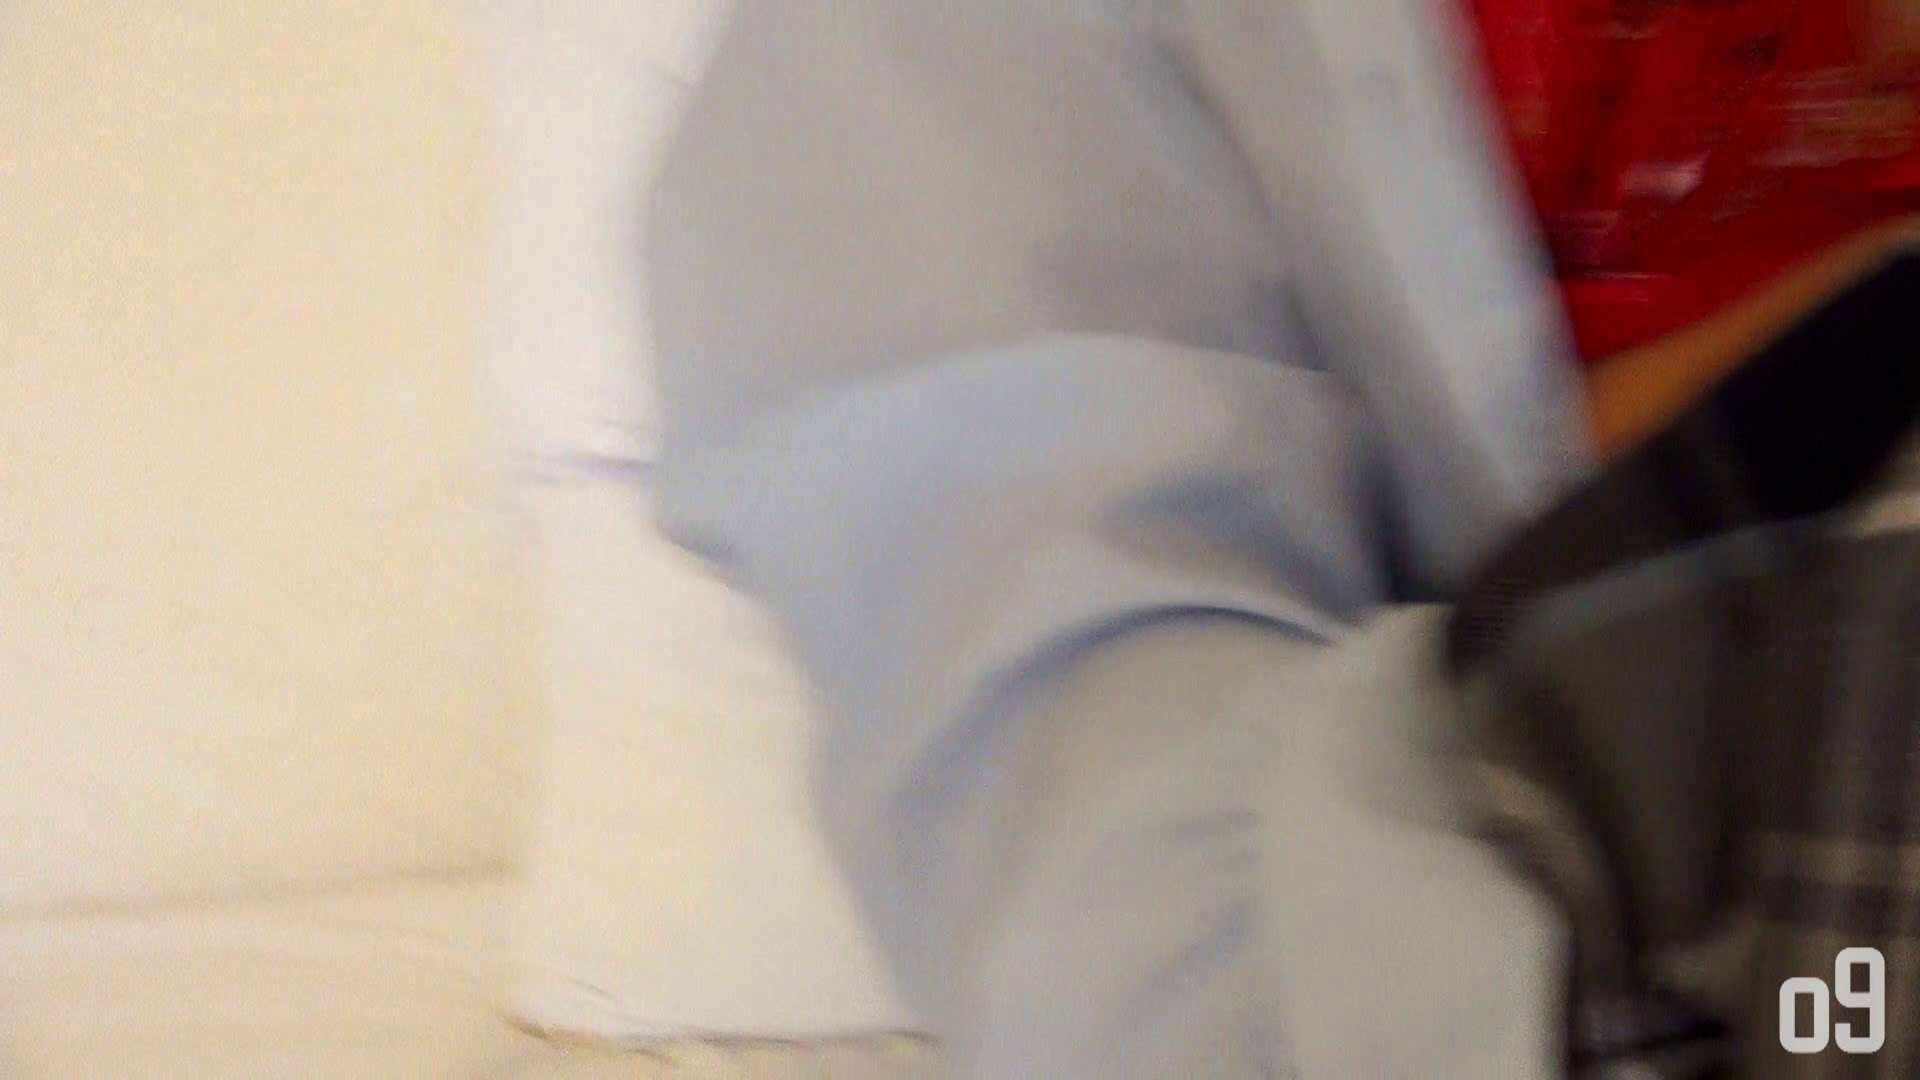 vol.6 TKSさんが震える!留華ちゃんの不慣れな手コキで念願の射精! 下着   OLのエロ生活  43連発 1